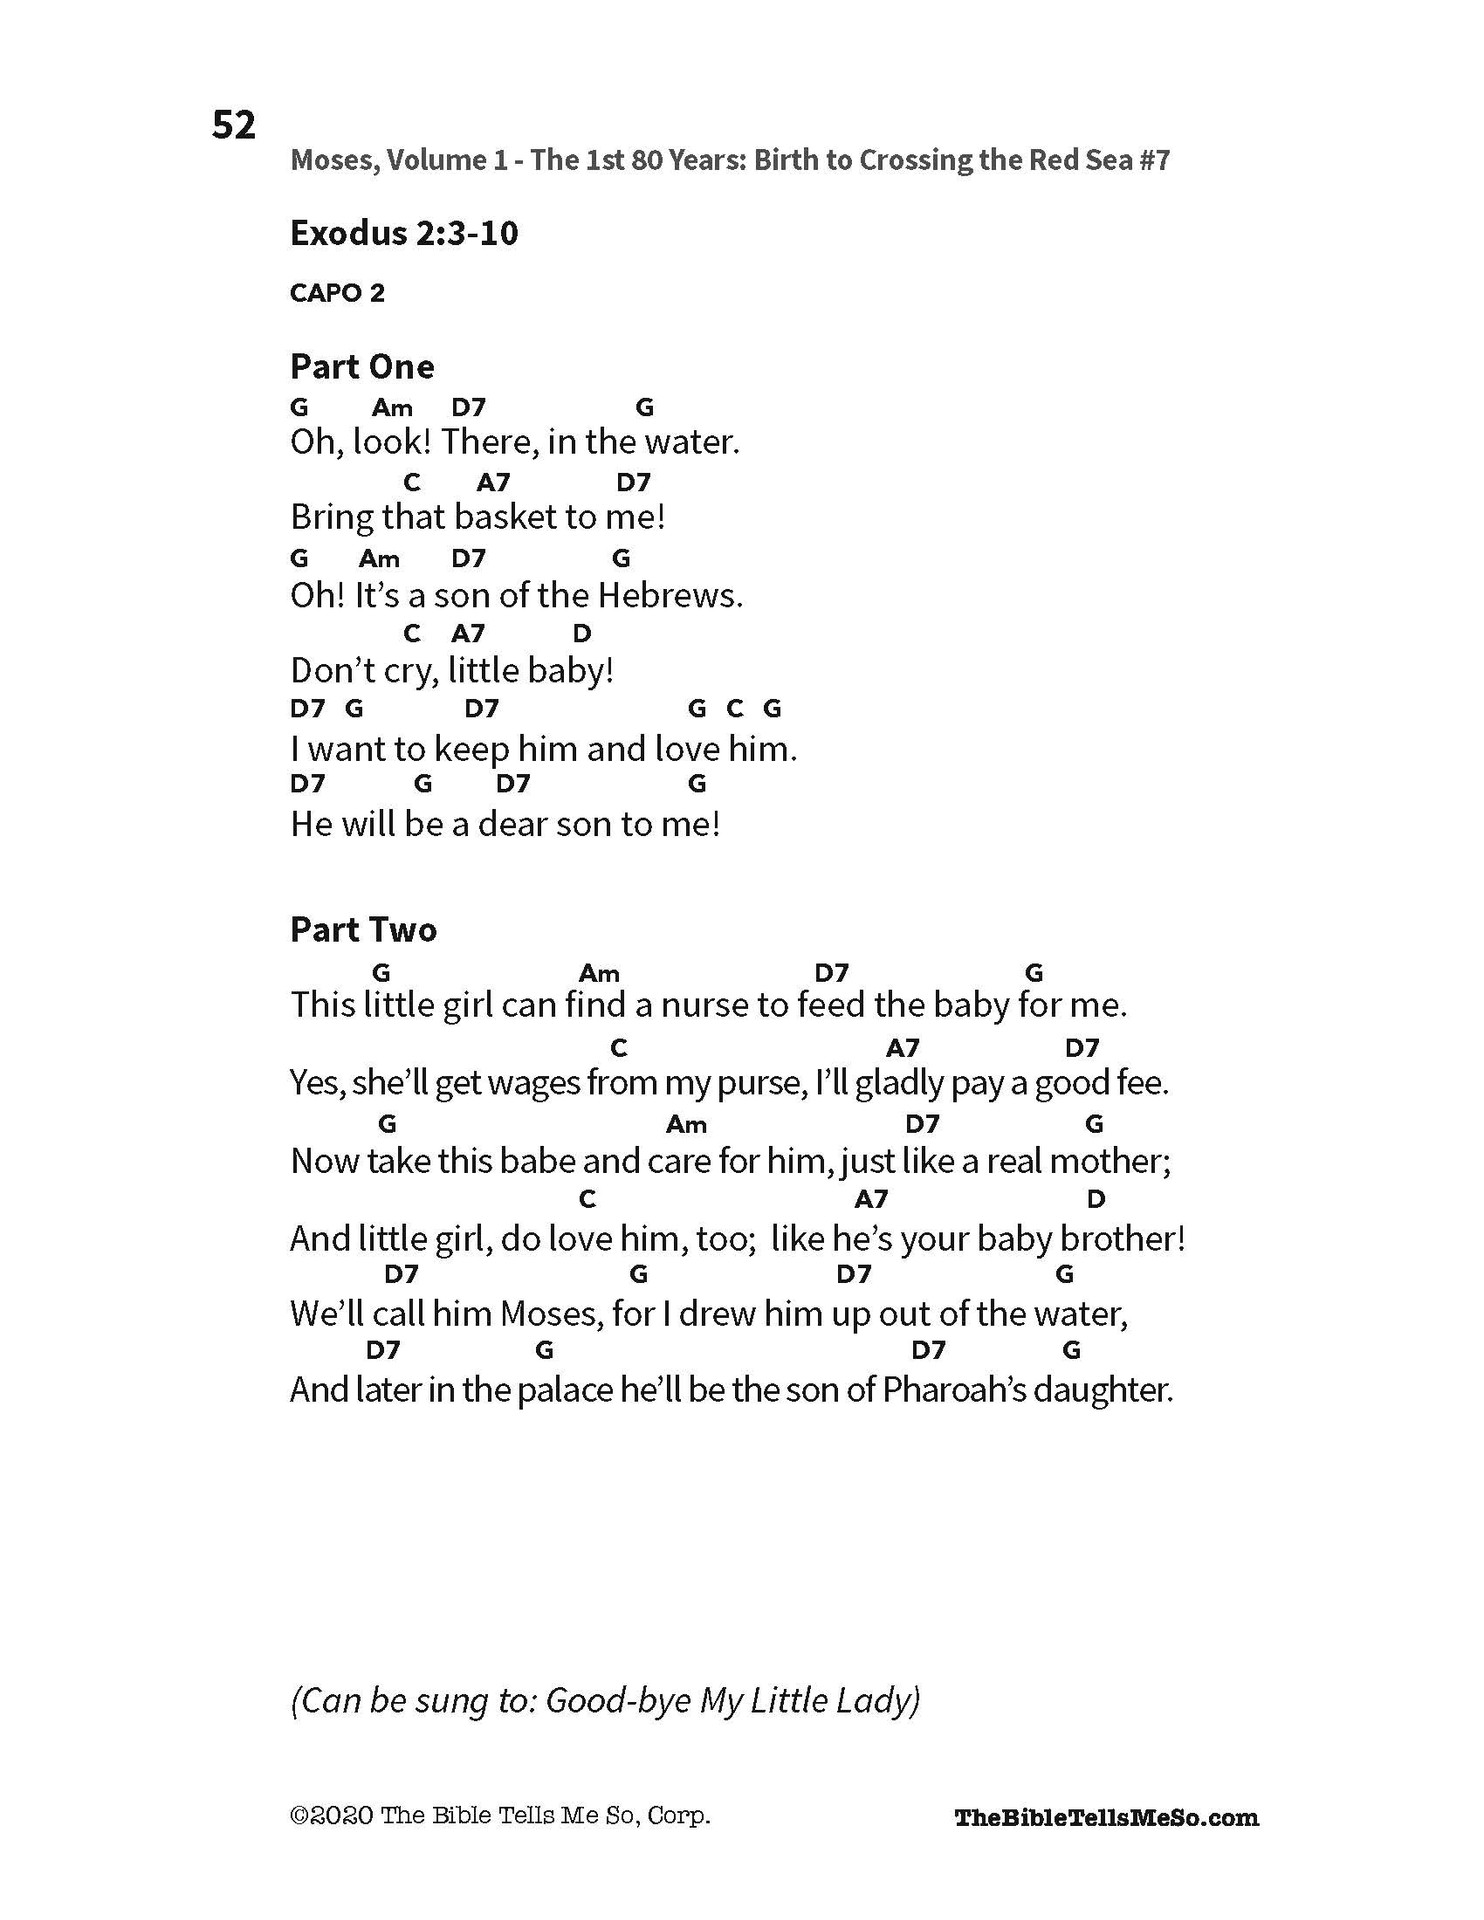 SongSheets-JPGS_Page_054.jpg